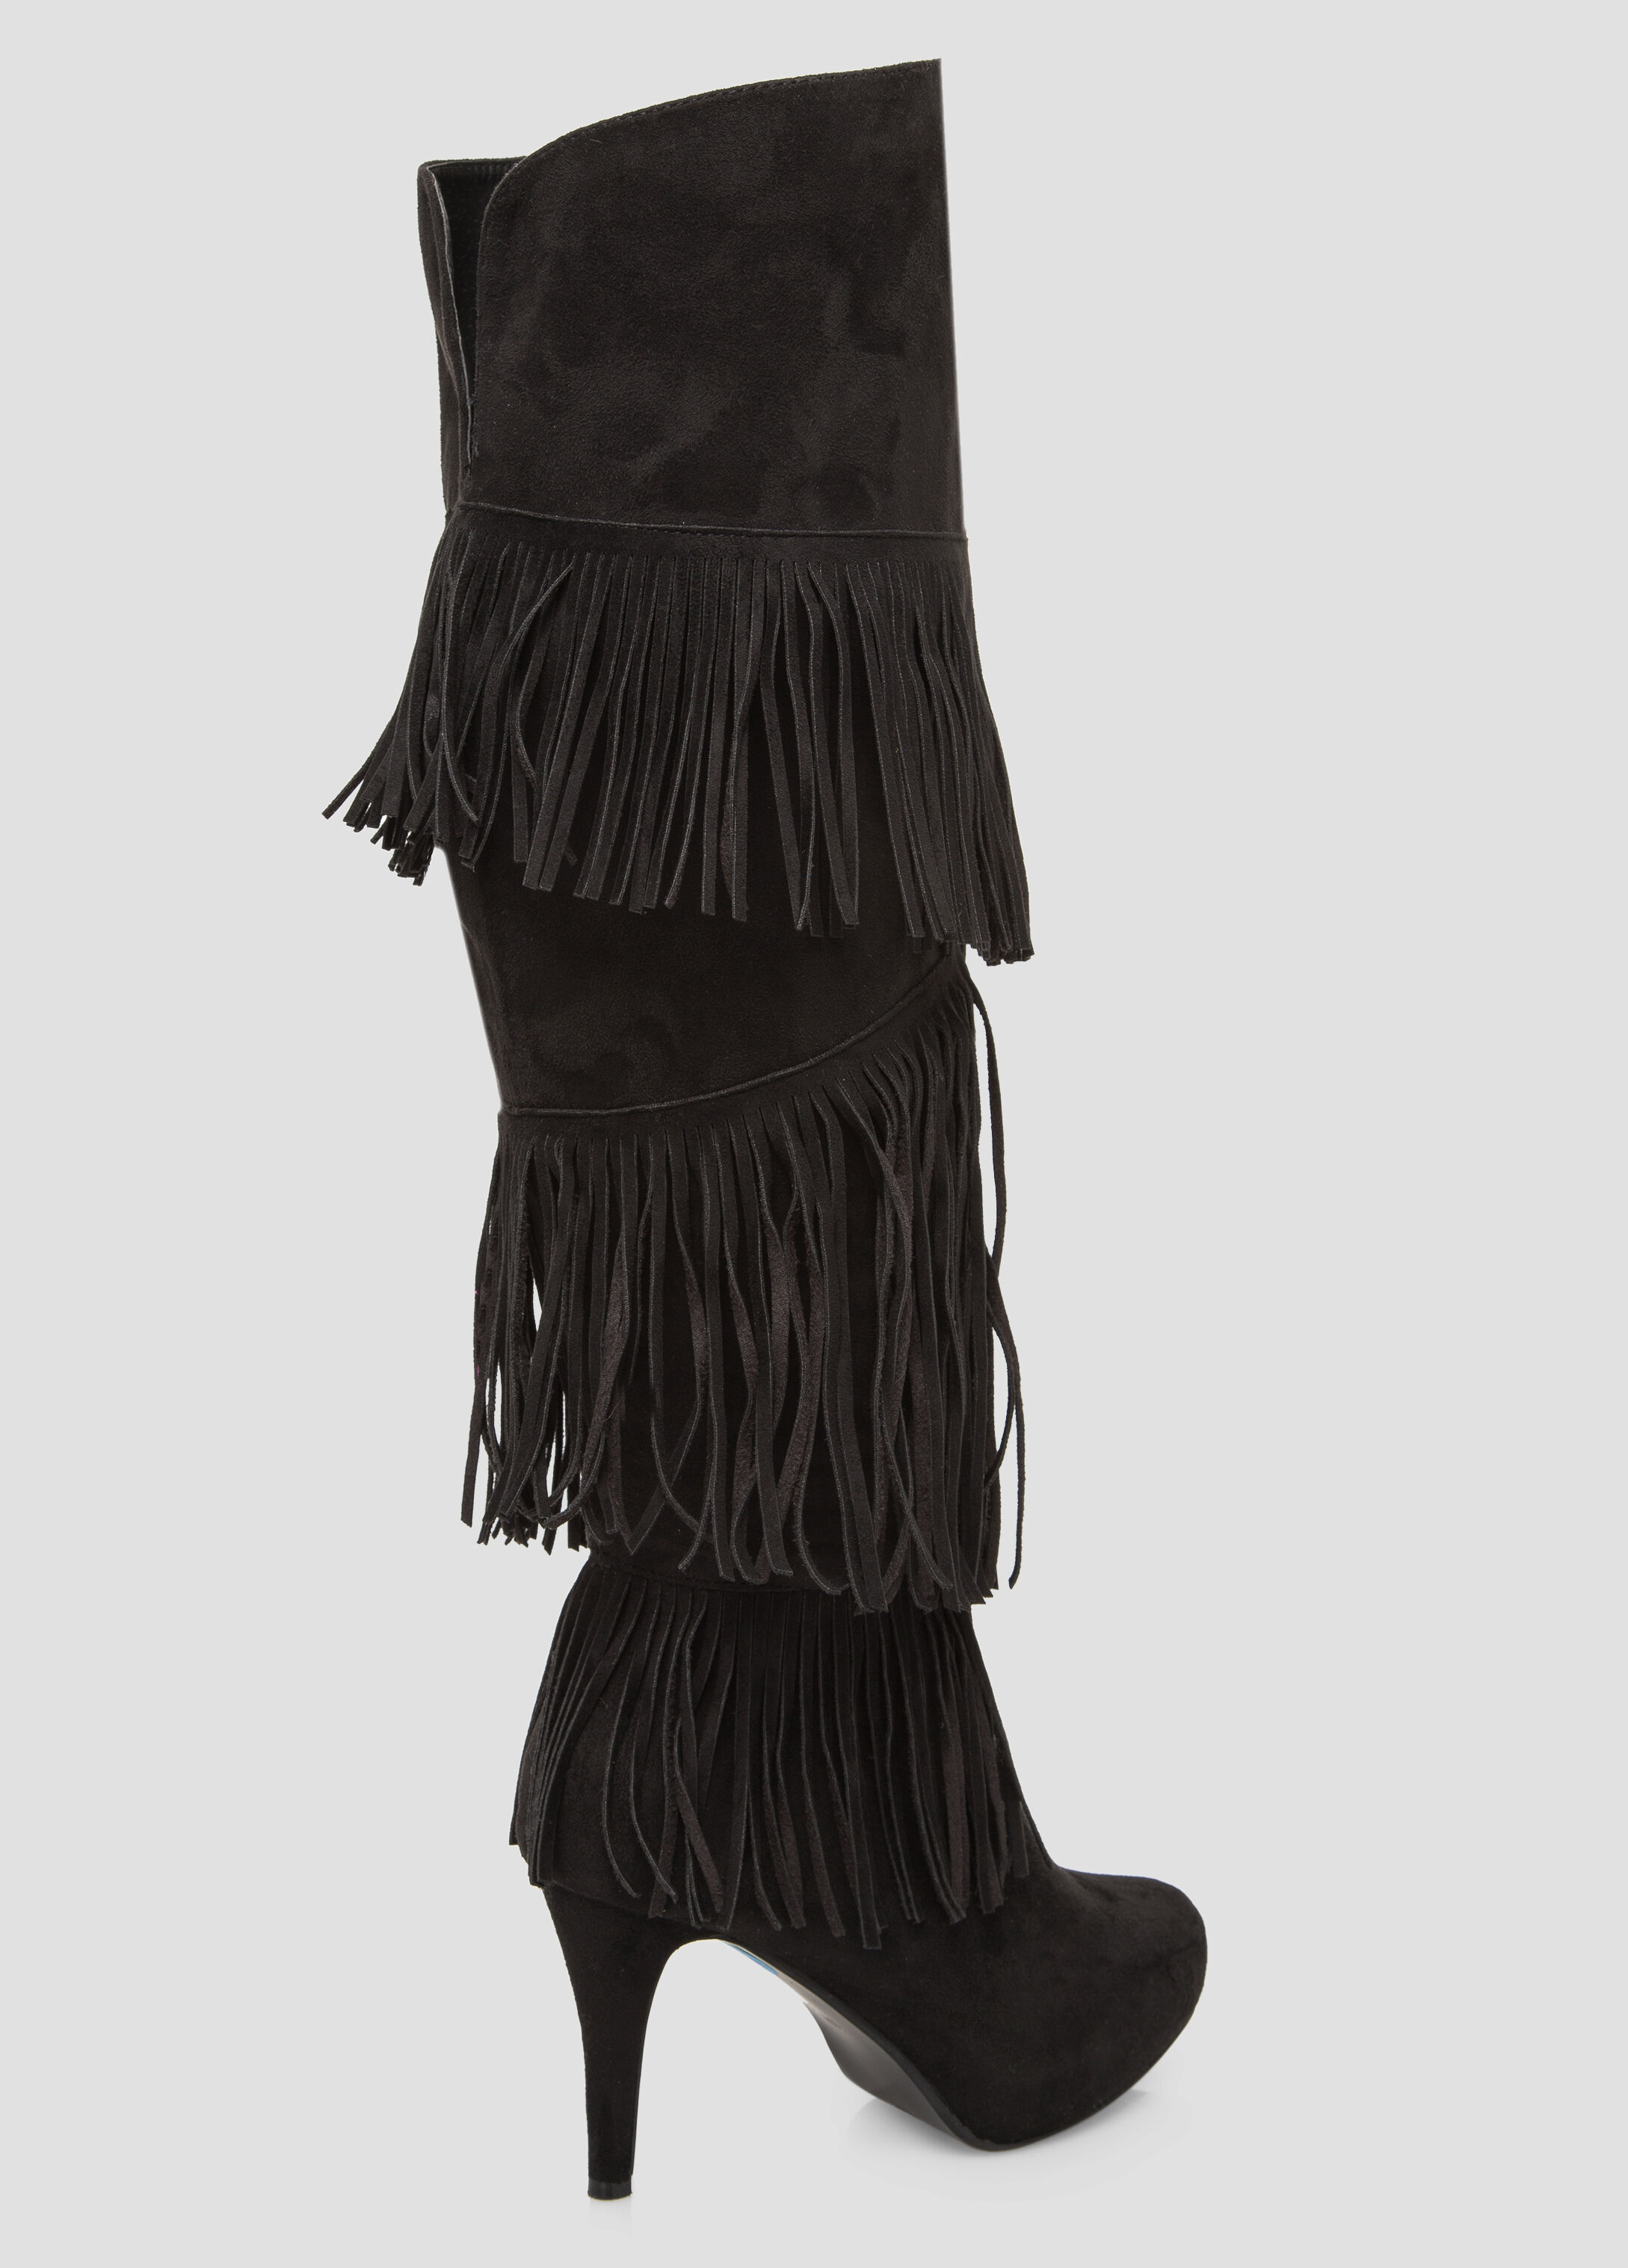 Fringe Knee High Boot - Wide Calf, Wide Width